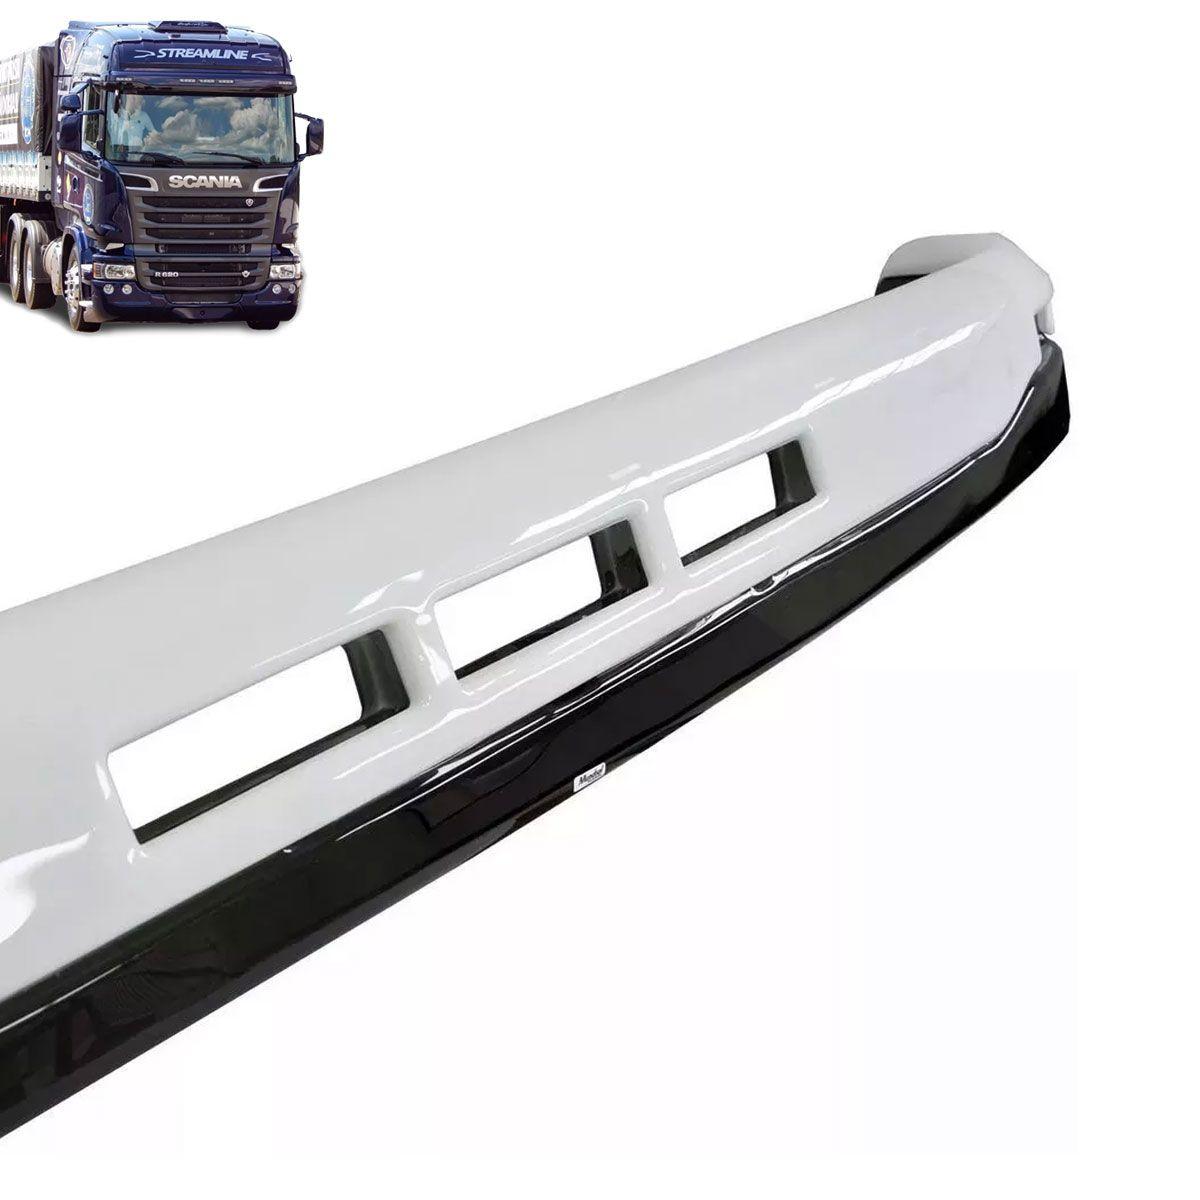 Tapa sol Bipartido compatível Scania S6 Streamline 2117869 2055596